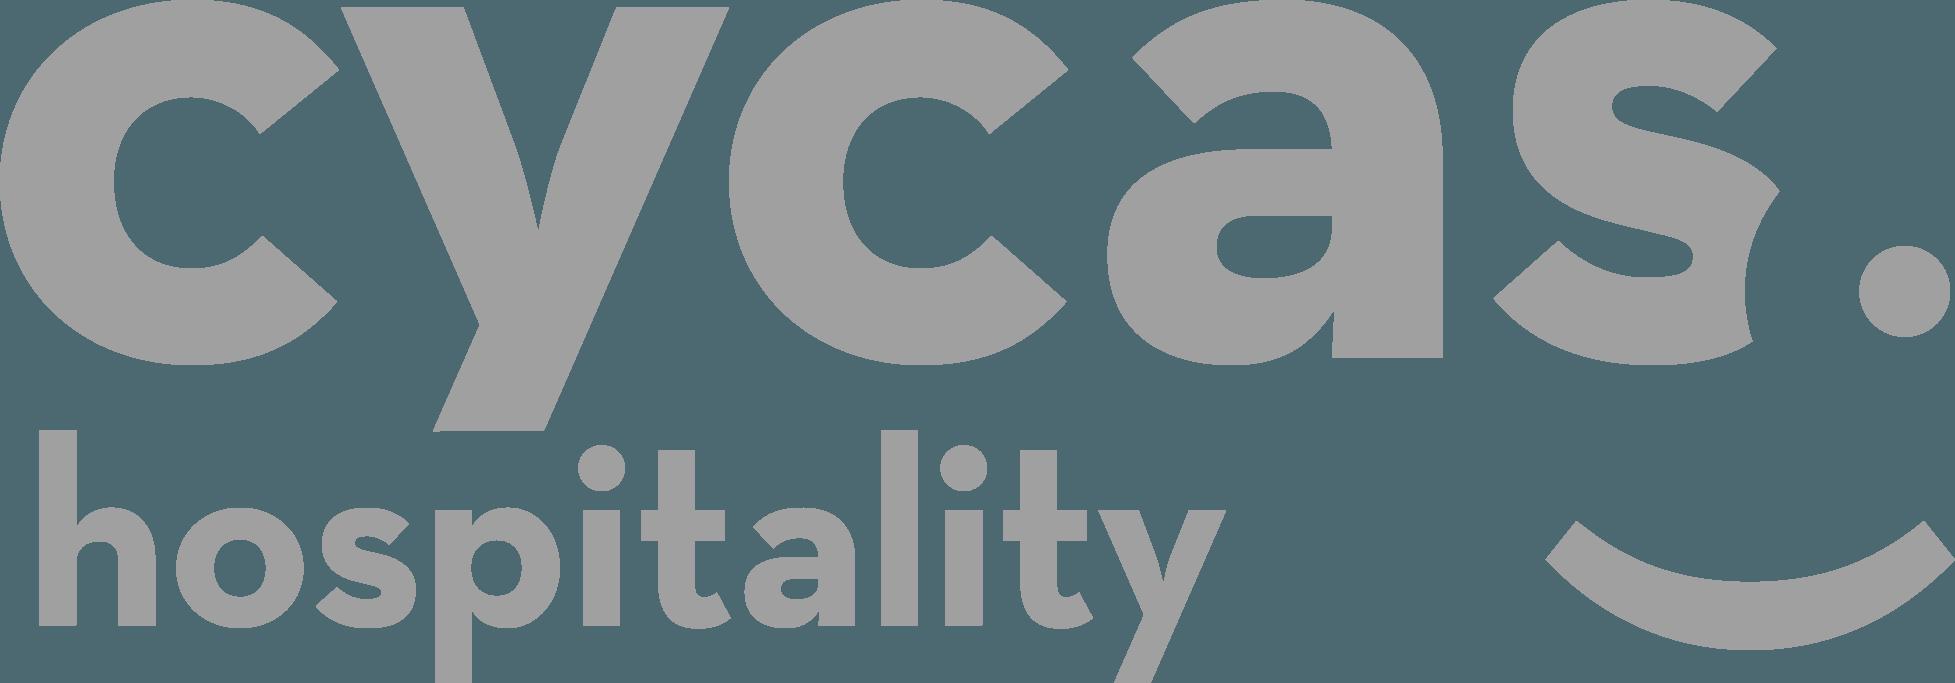 Cycas Hospitality